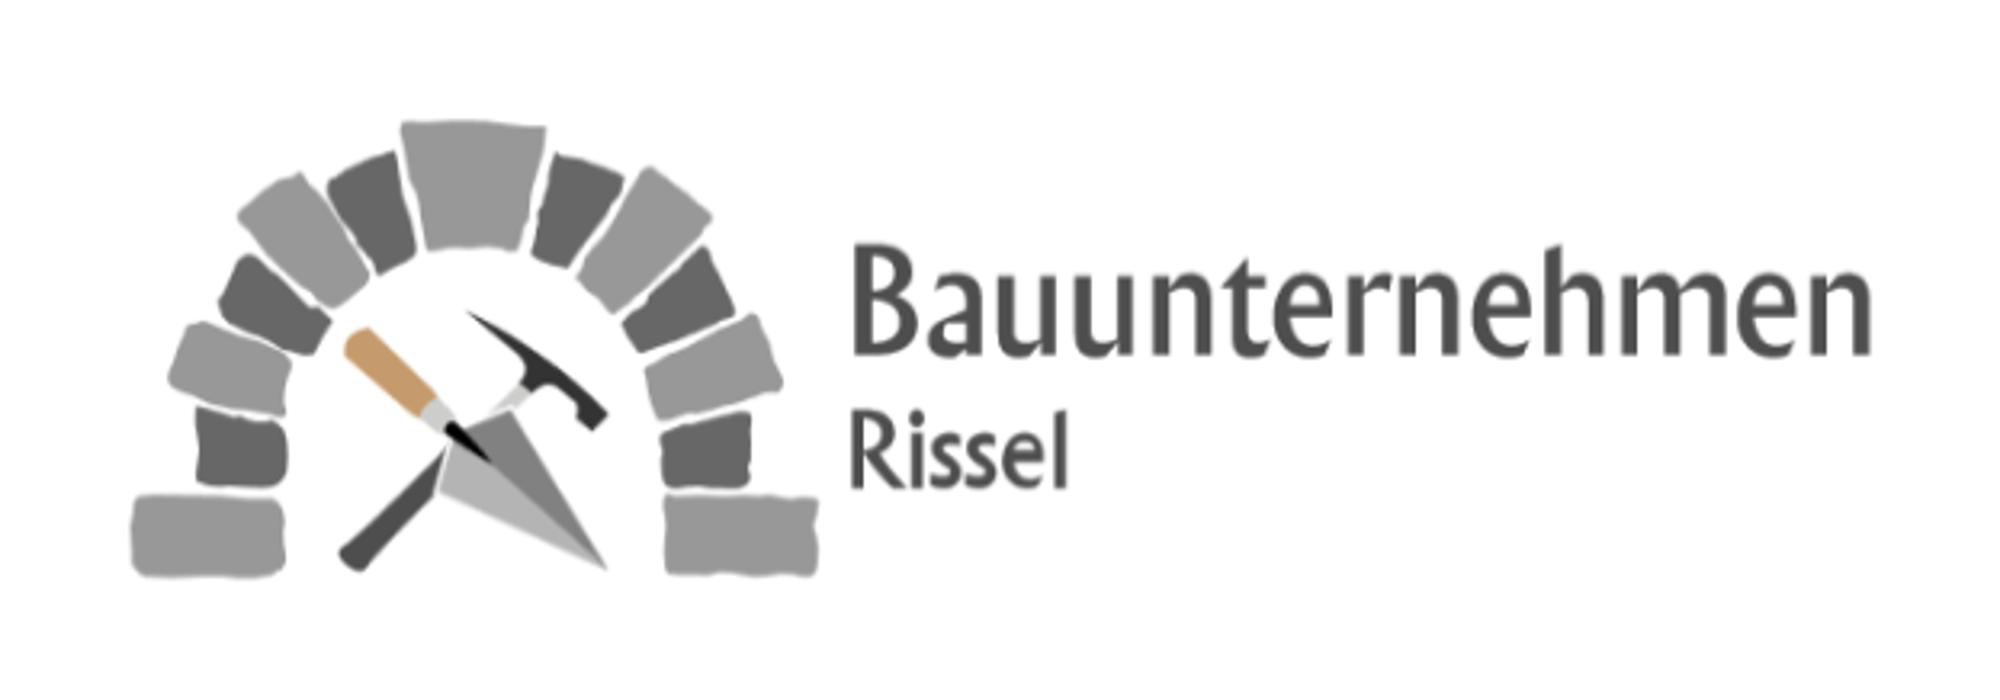 Bild zu Bauunternehmen Rissel in Schkeuditz